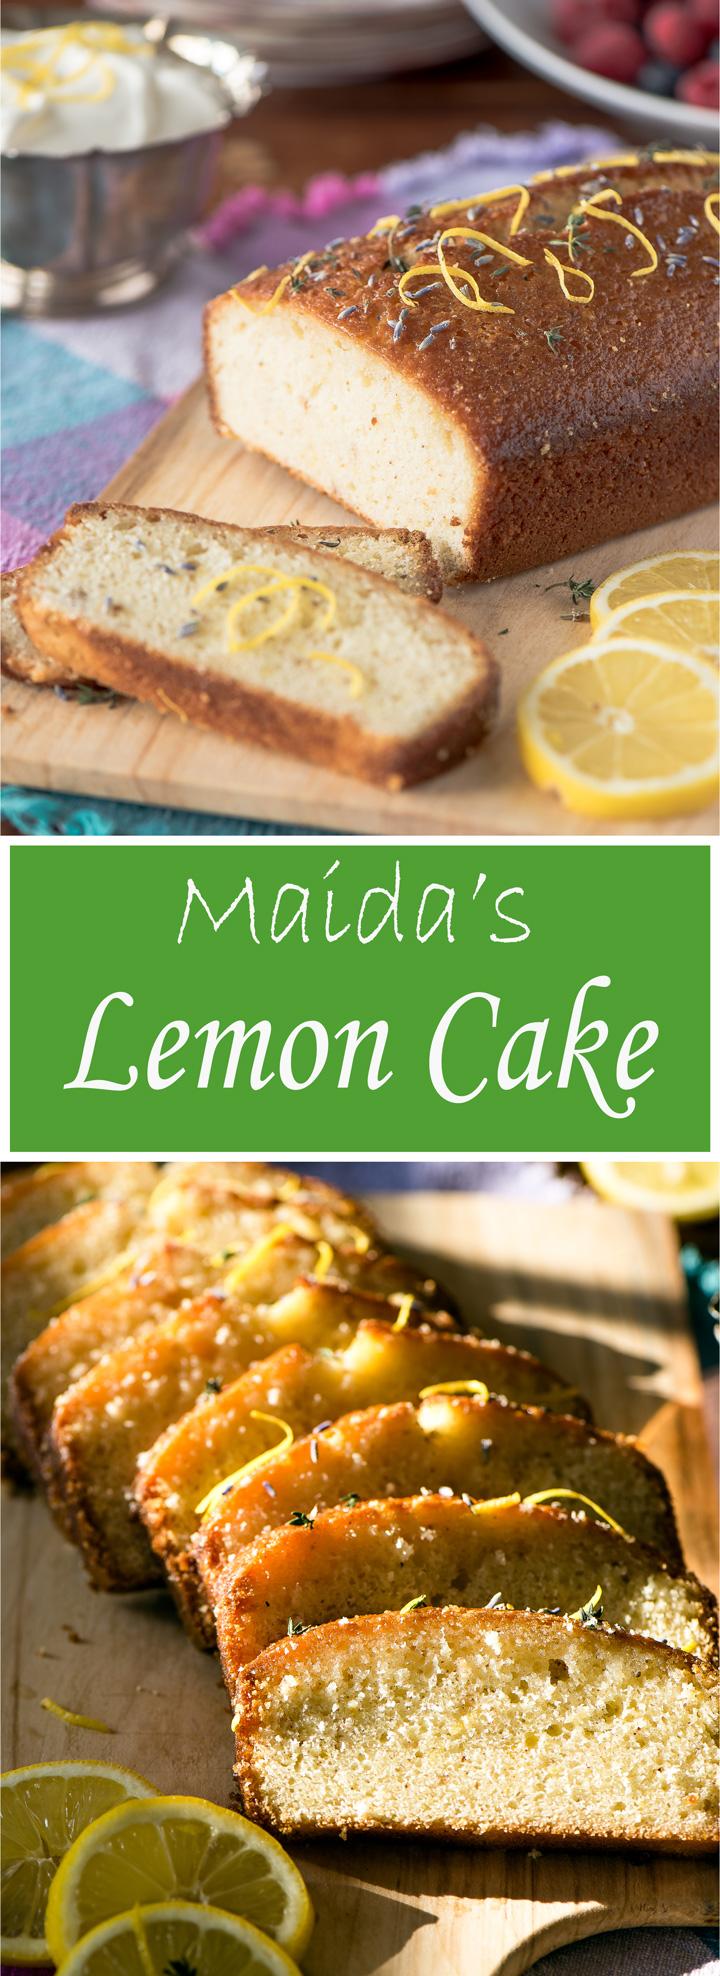 Maida Heatter S Lemon Cake